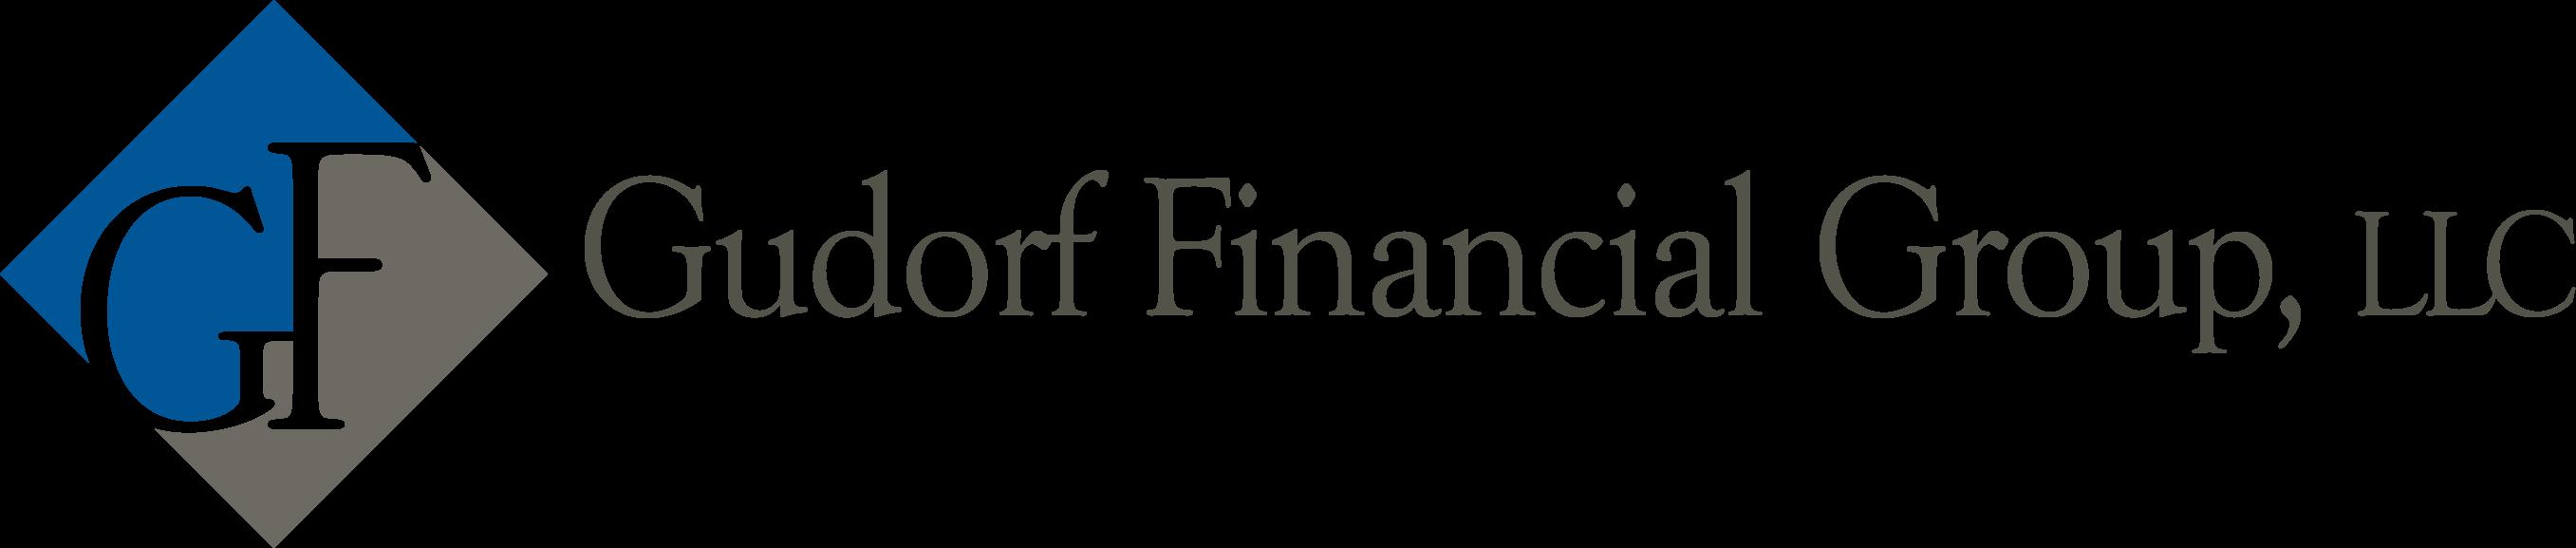 Logo for Gudorf Financial Group